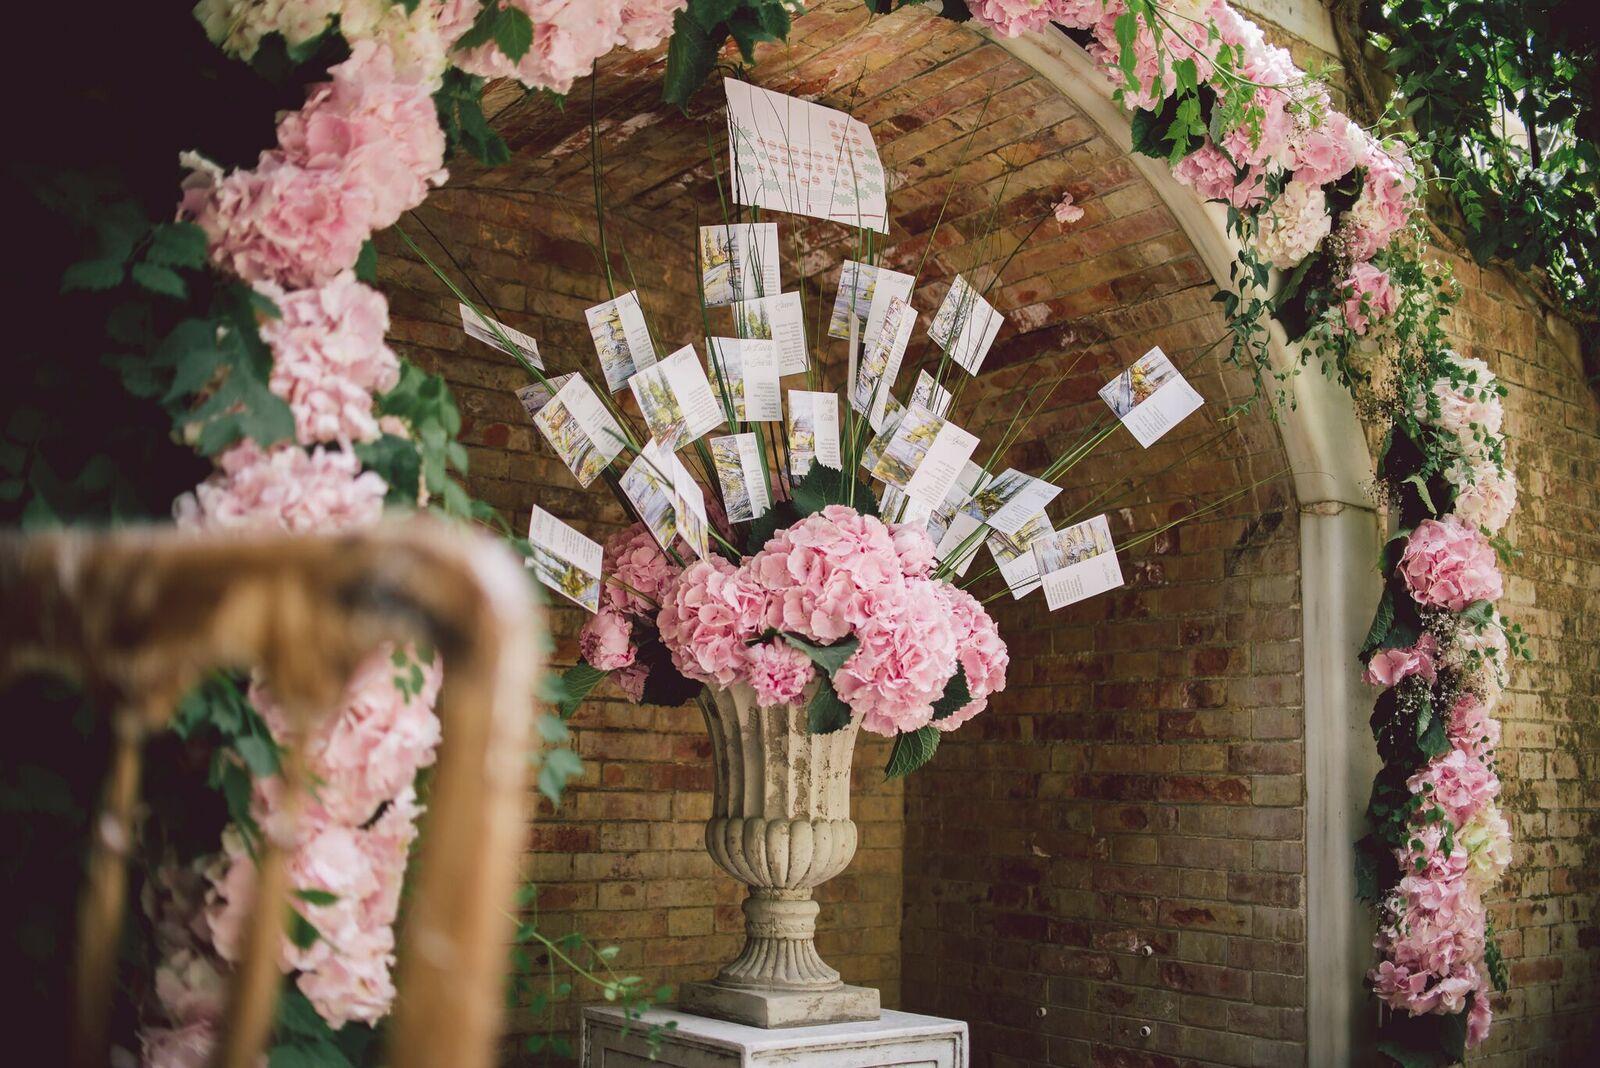 Si-Quiero-Wedding-Planner-Sira-Antequera-Elena-Carlos-007